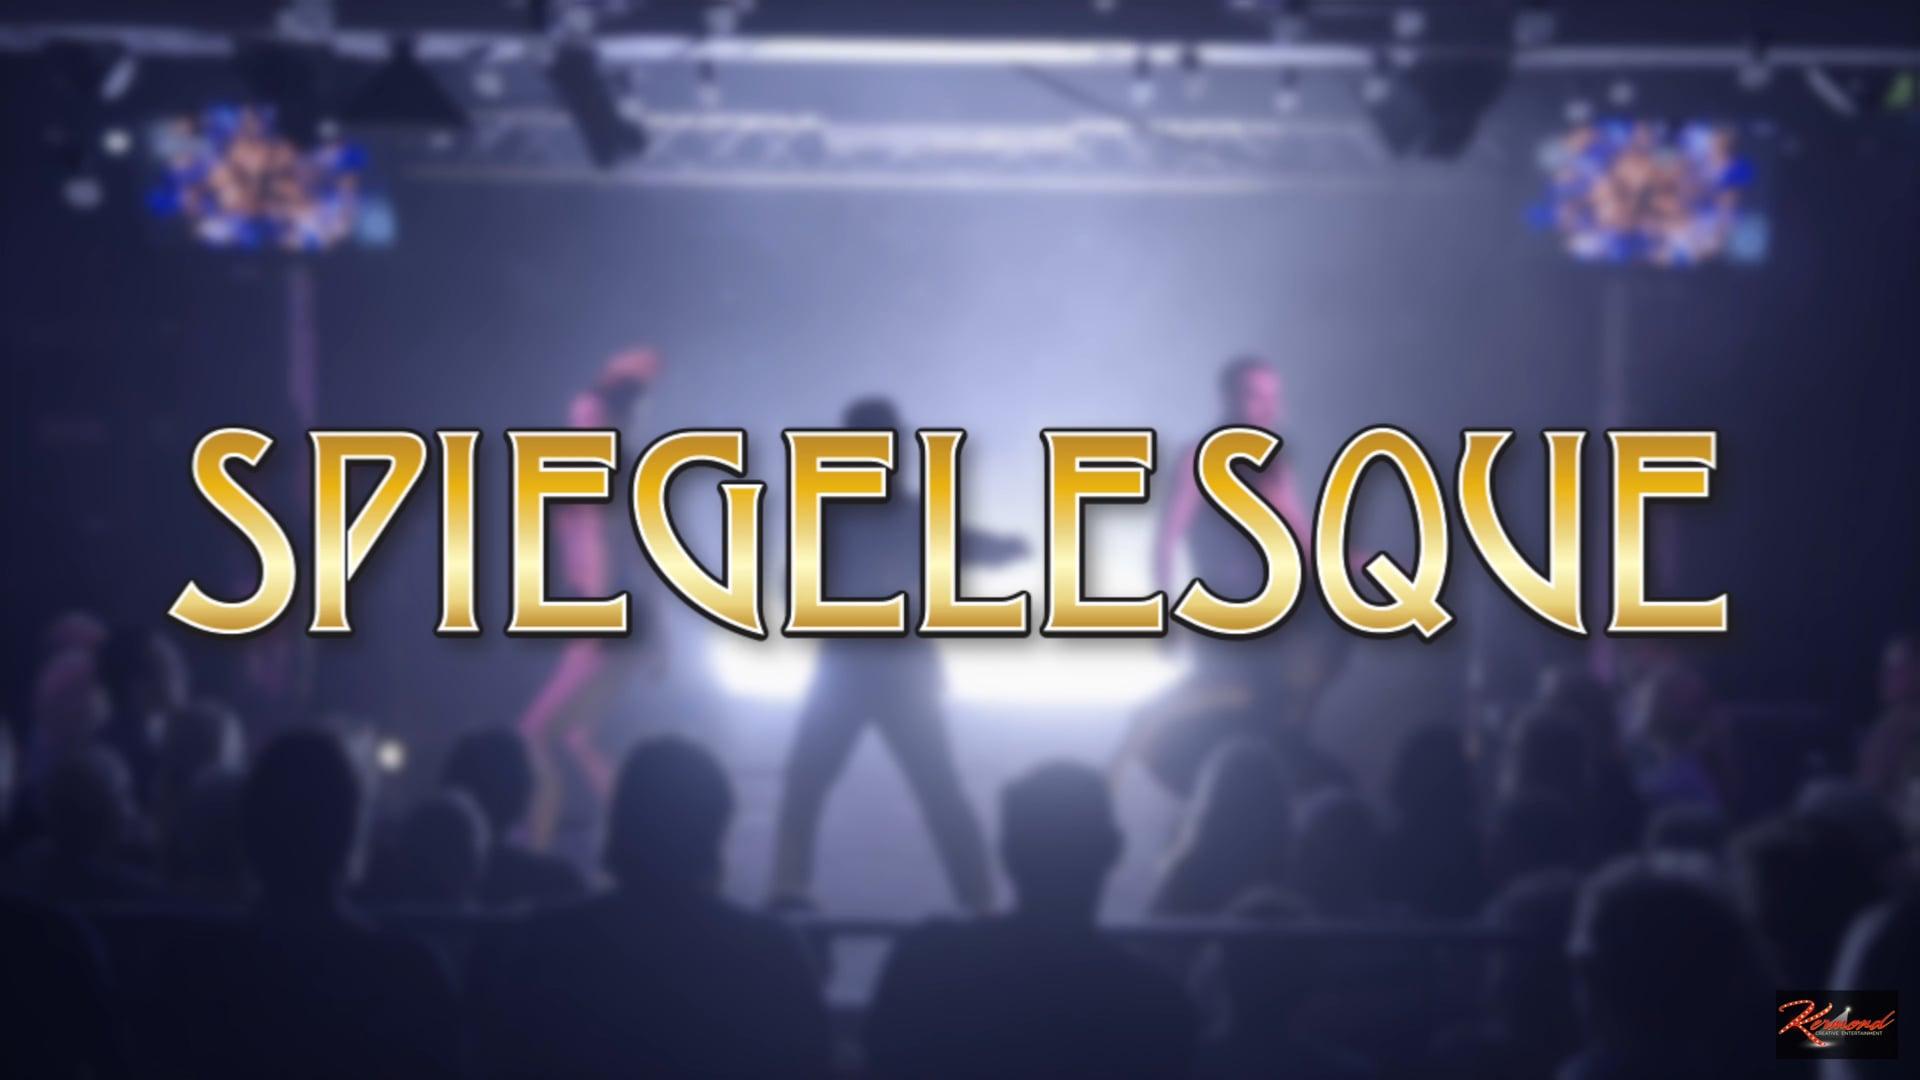 Spiegelesque - Vaudeville Burlesque Cabaret!